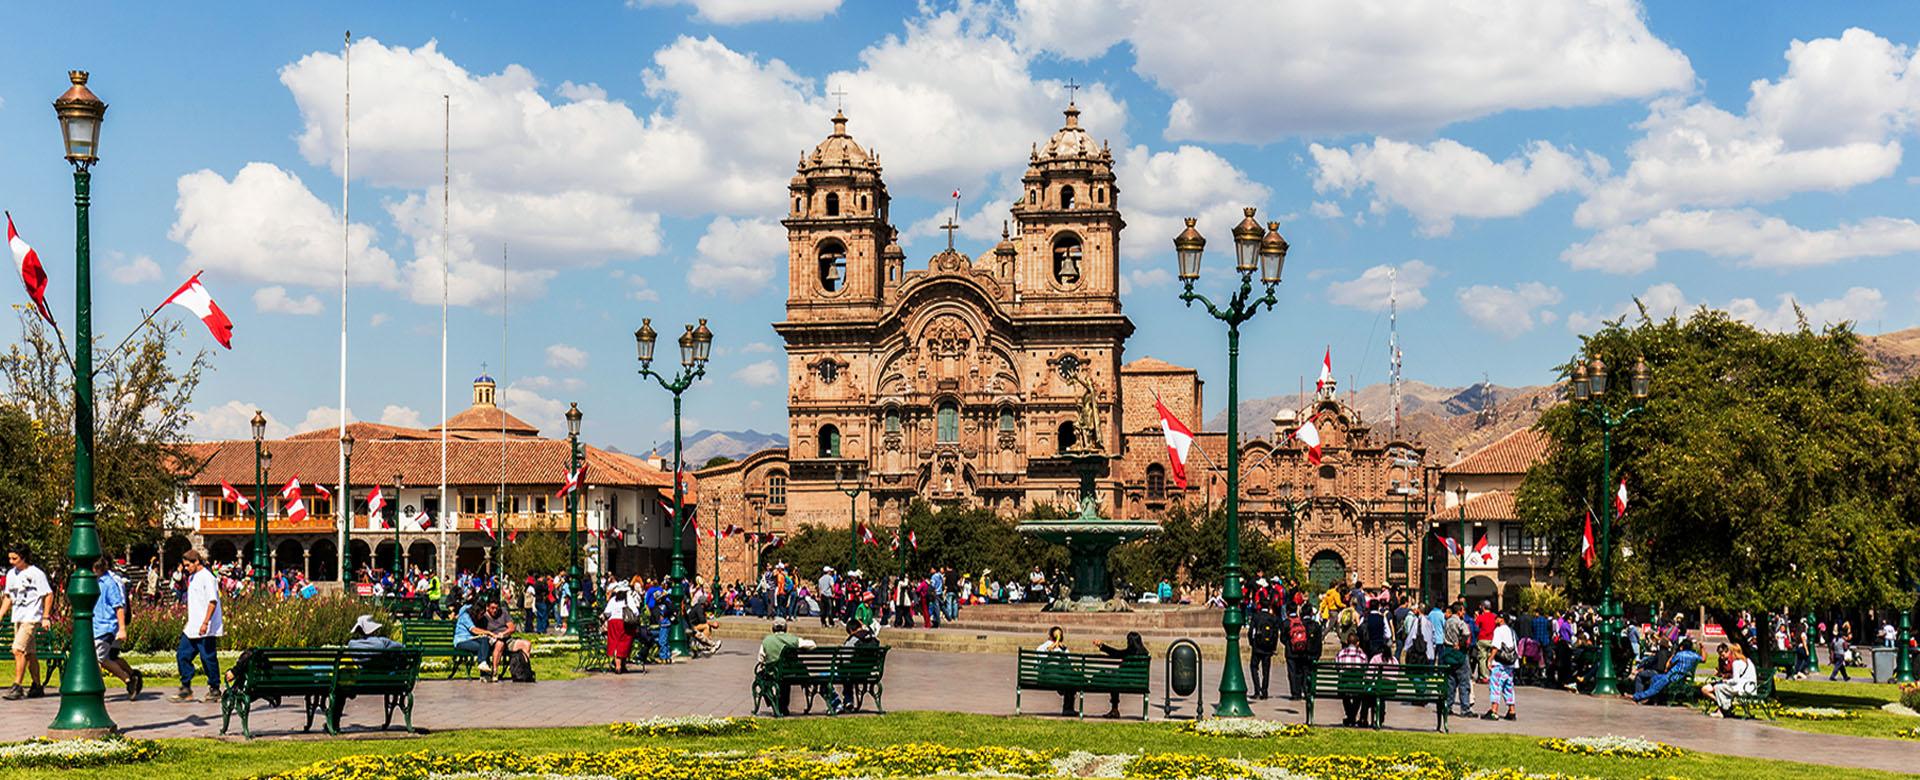 Basilica Cathedral of Cusco